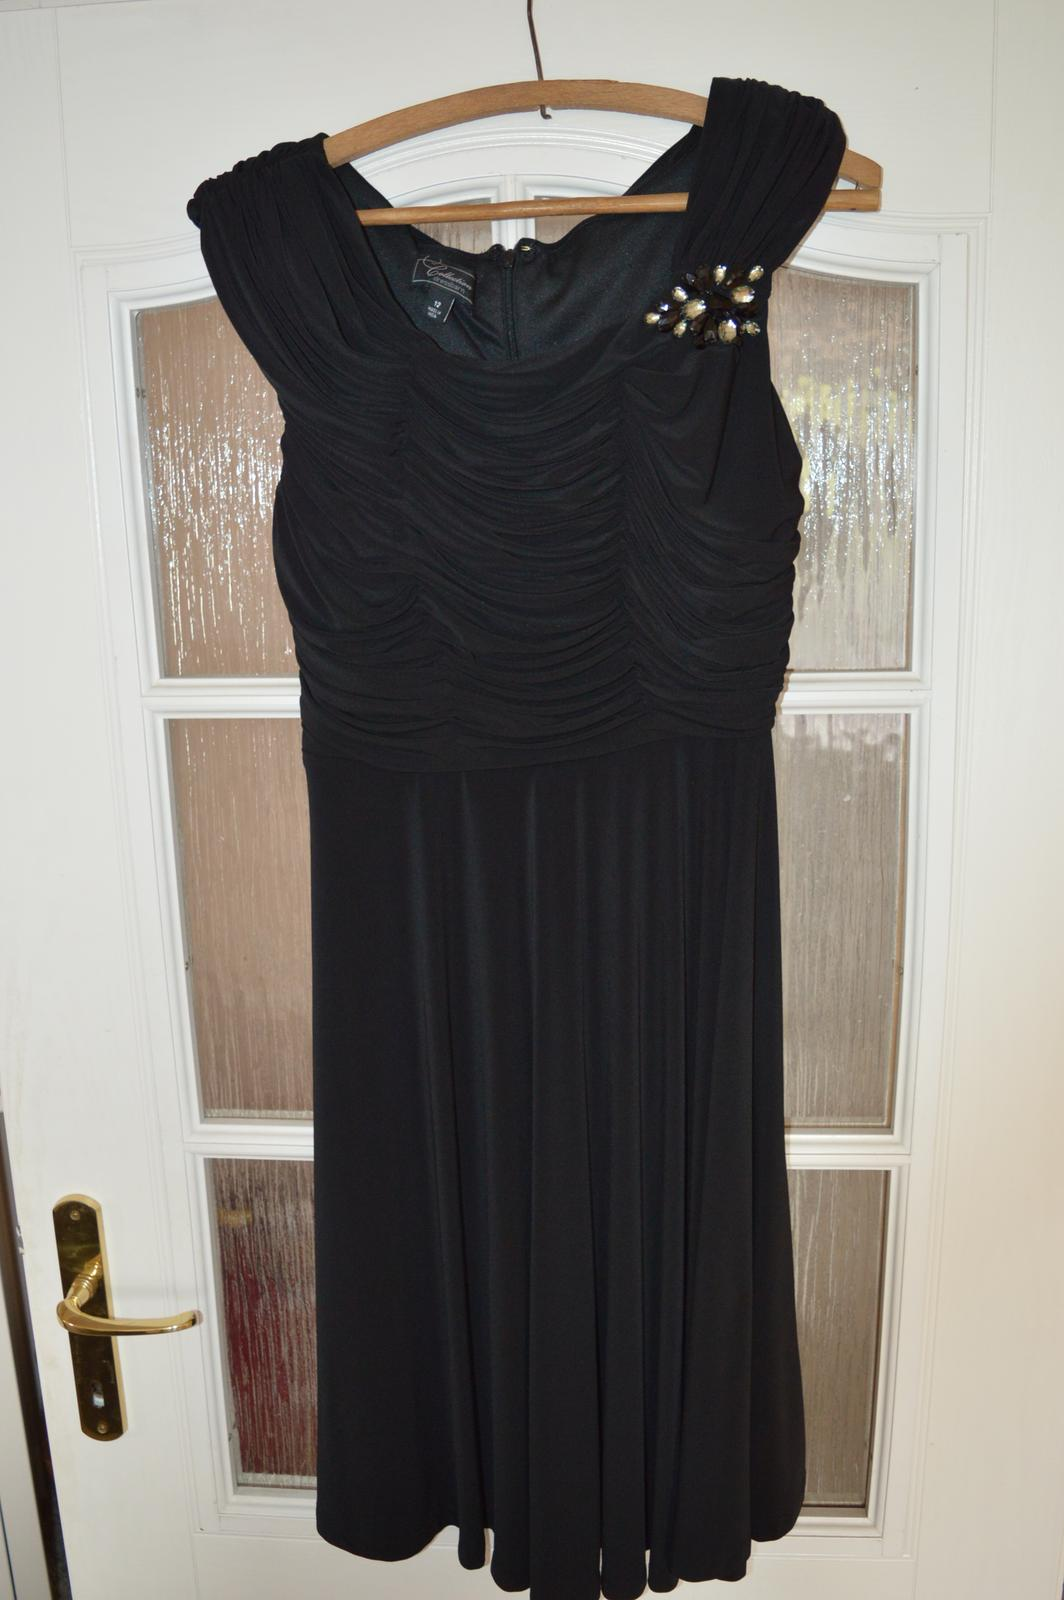 cdc7e64e334c Spoločenské krátke čierne šaty l-xl